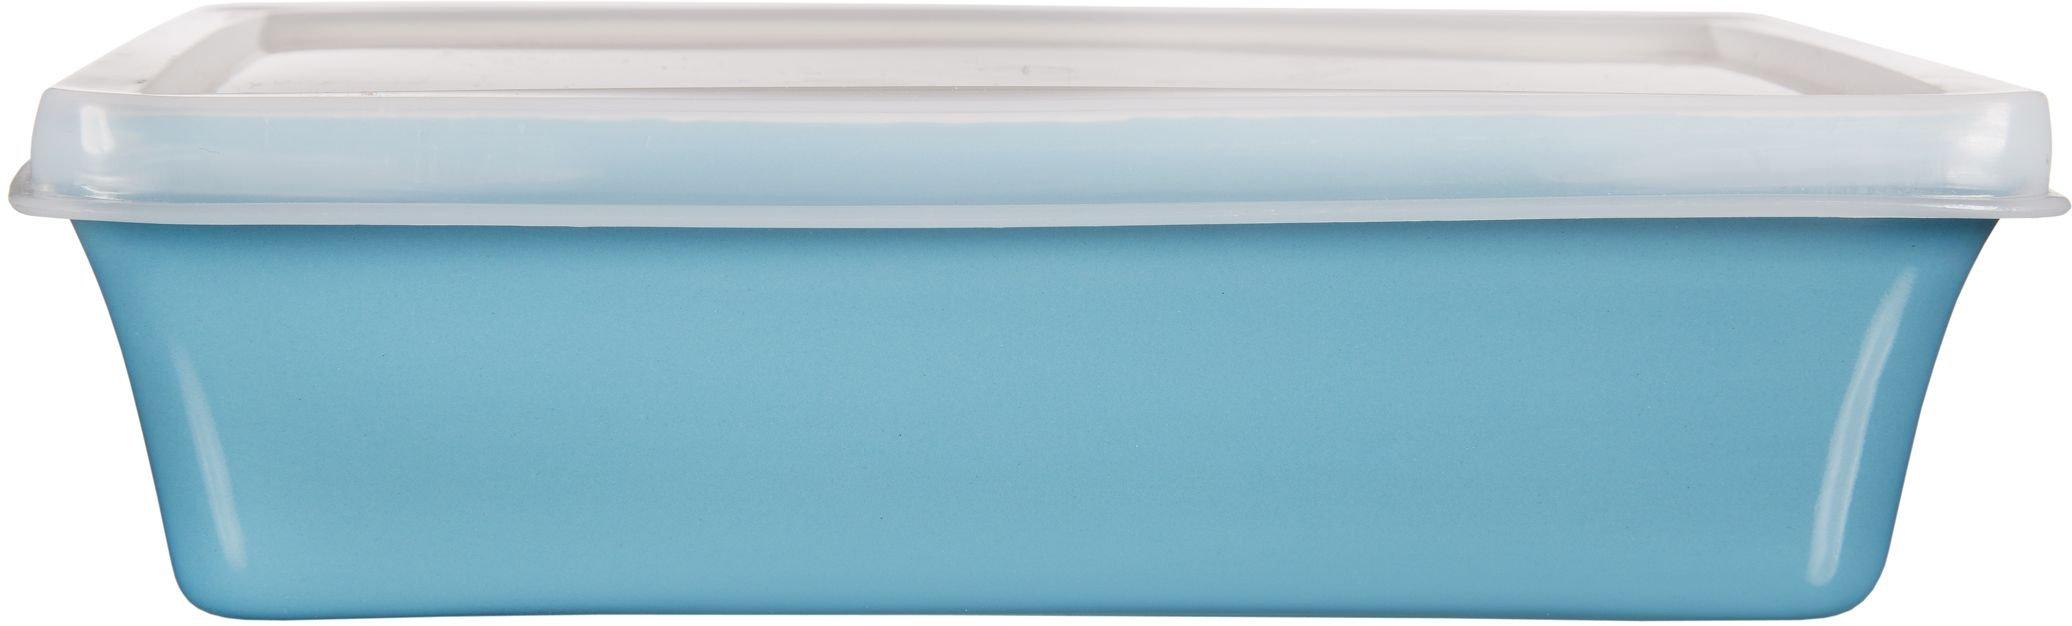 Home Essentials & Beyond Storage 16 oz Rectangular Baker with Lid, Aqua/Clear